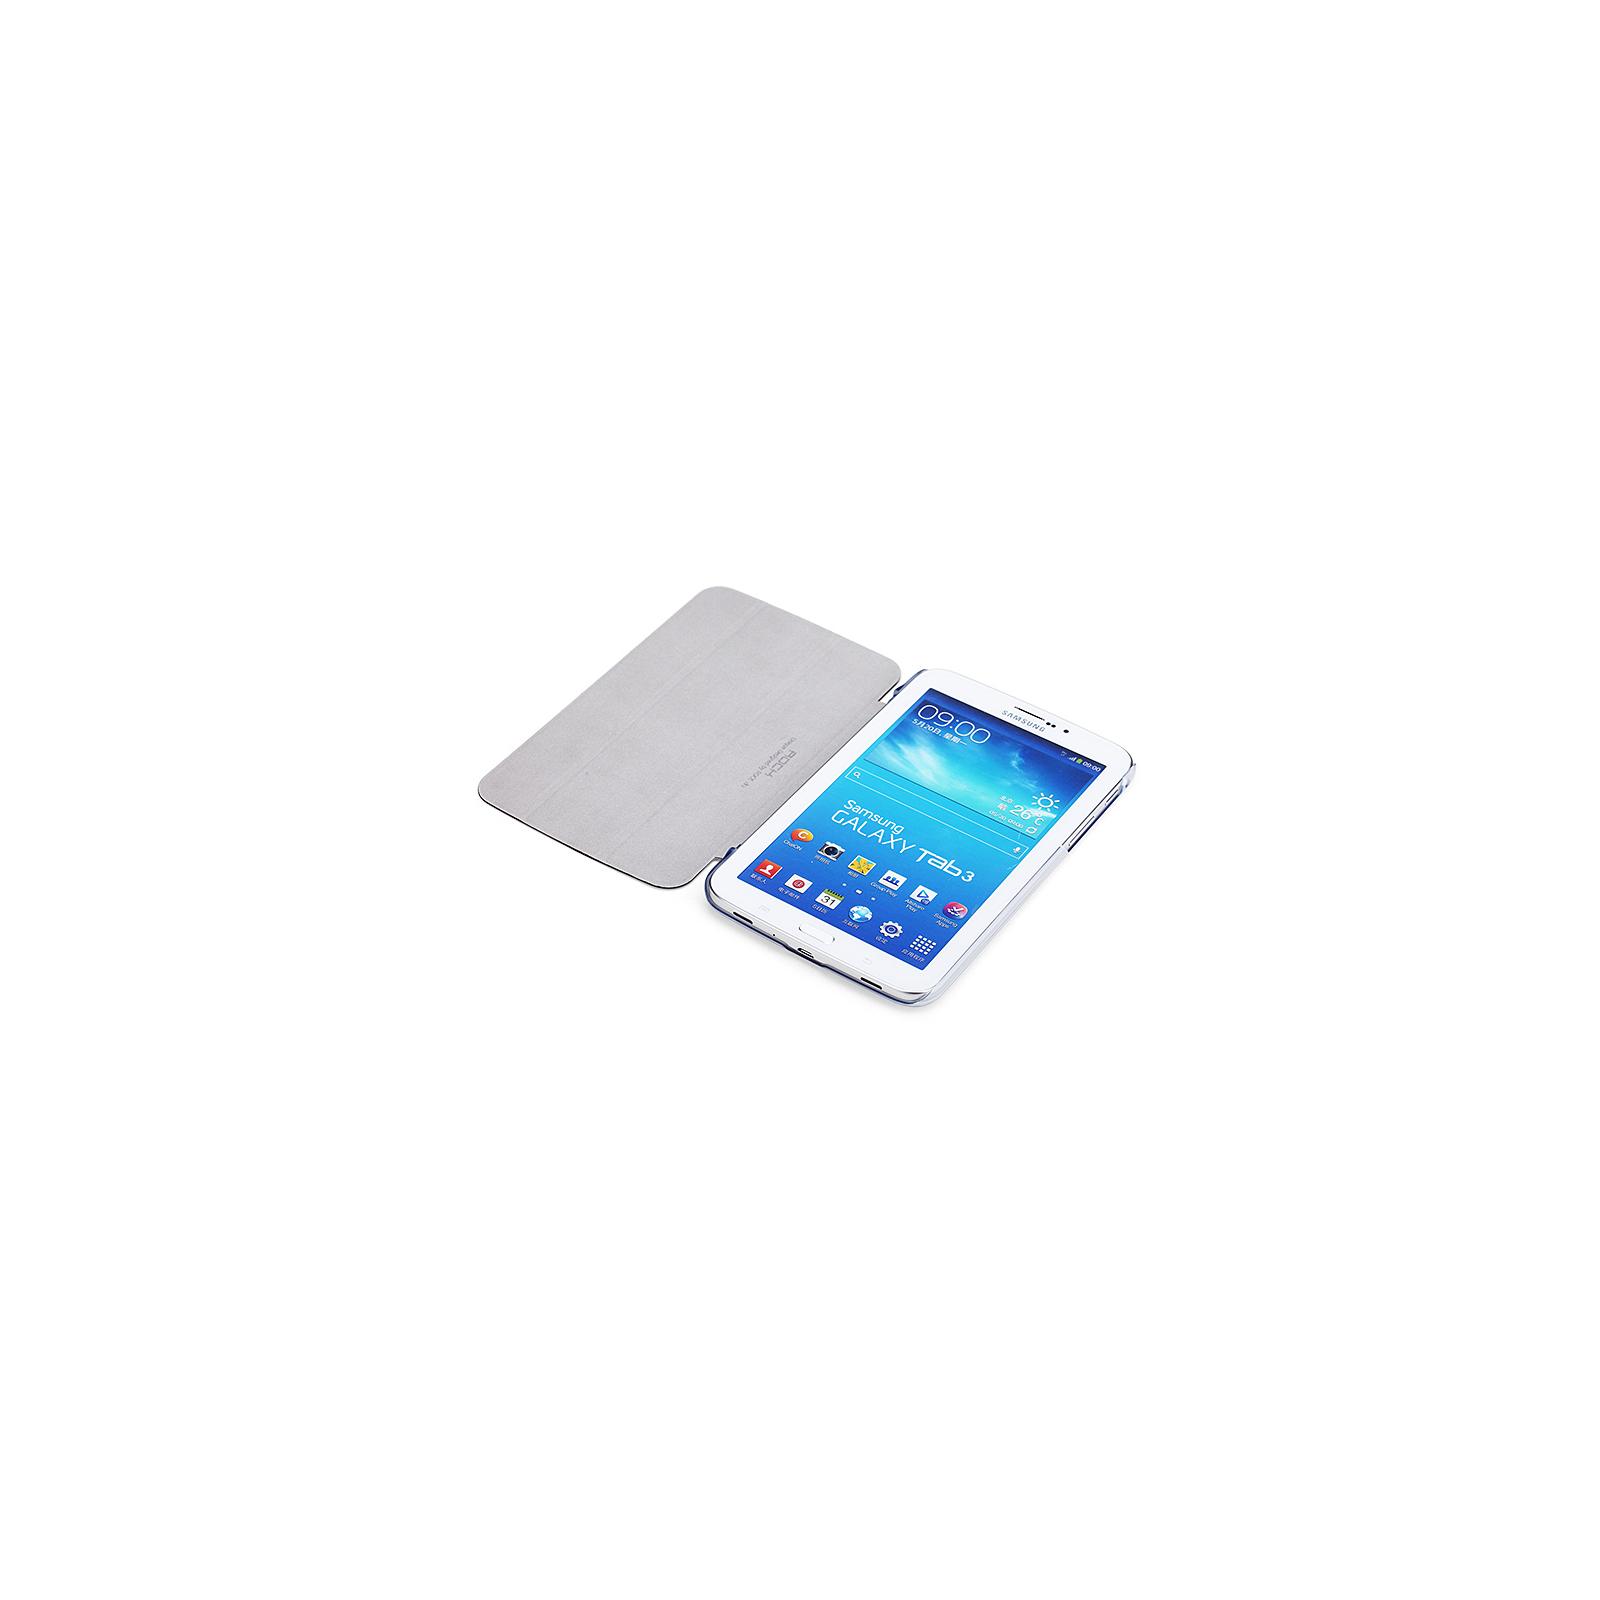 "Чехол для планшета Rock 7"" Samsung Galaxy Tab 3 7.0 T2100/T2110 Elegant Series (31849 black) изображение 6"